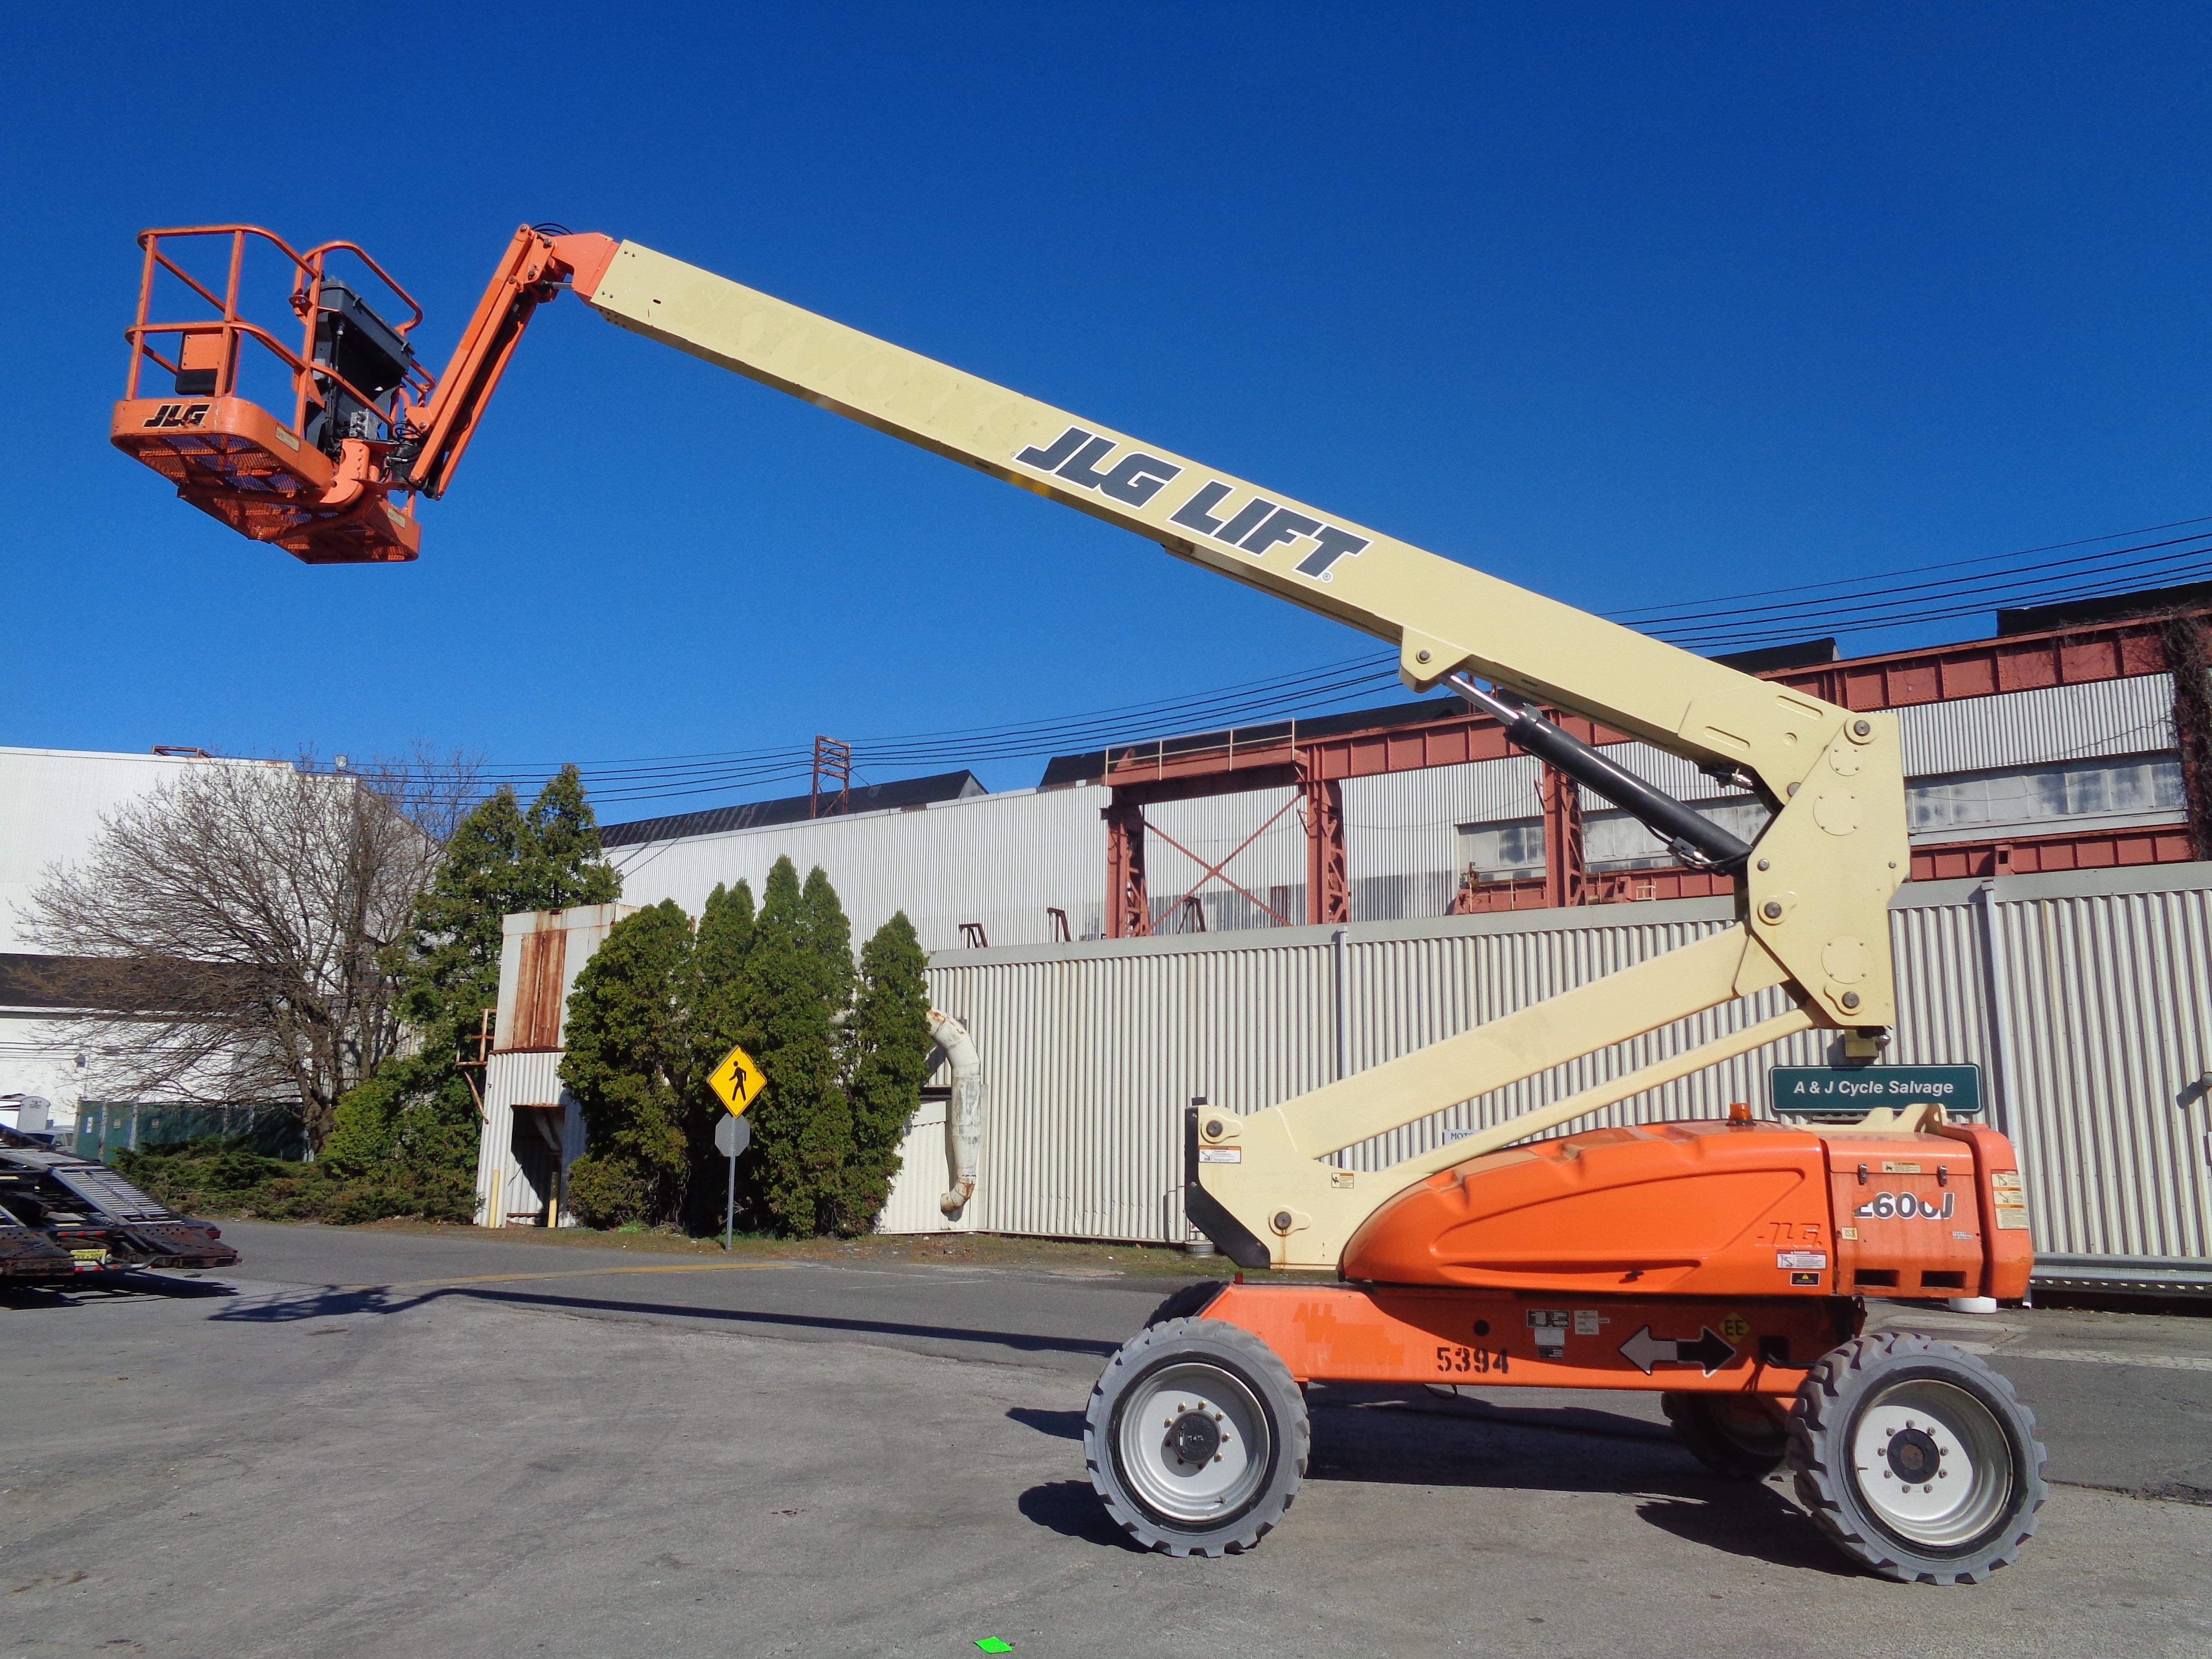 Lot 48 - 2011 JLG E600J Boom Lift